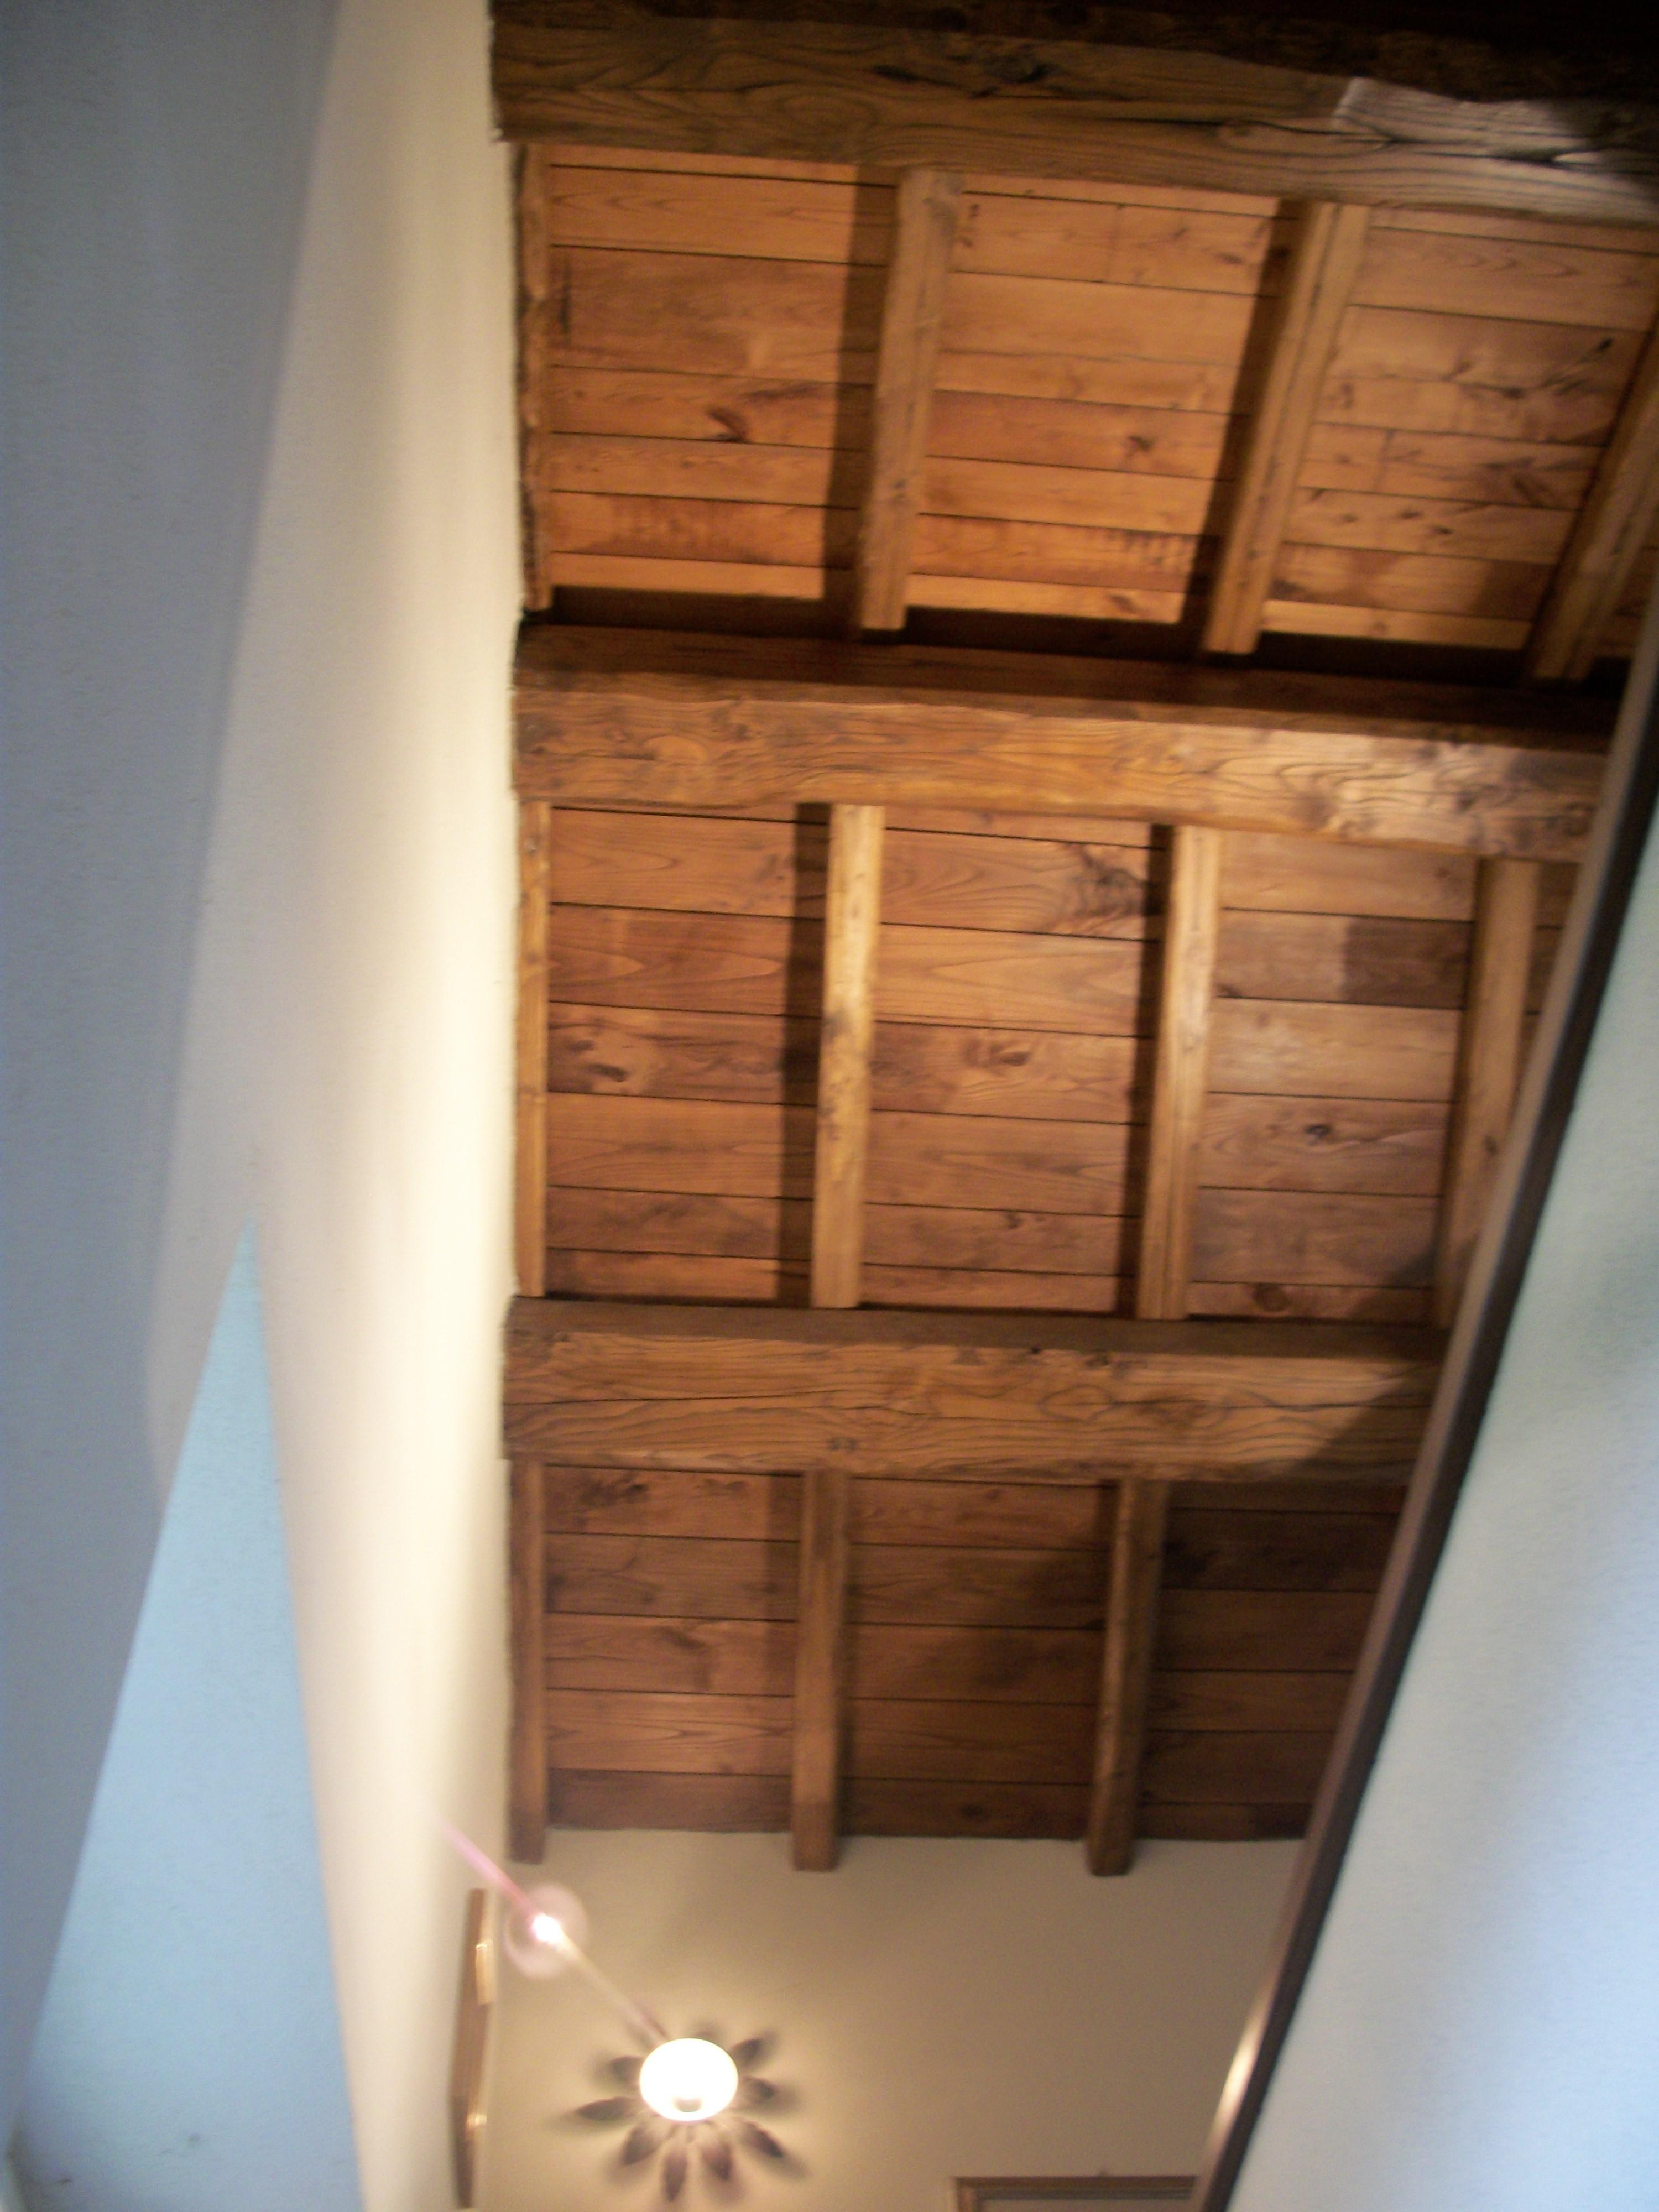 Roof chestnut beams